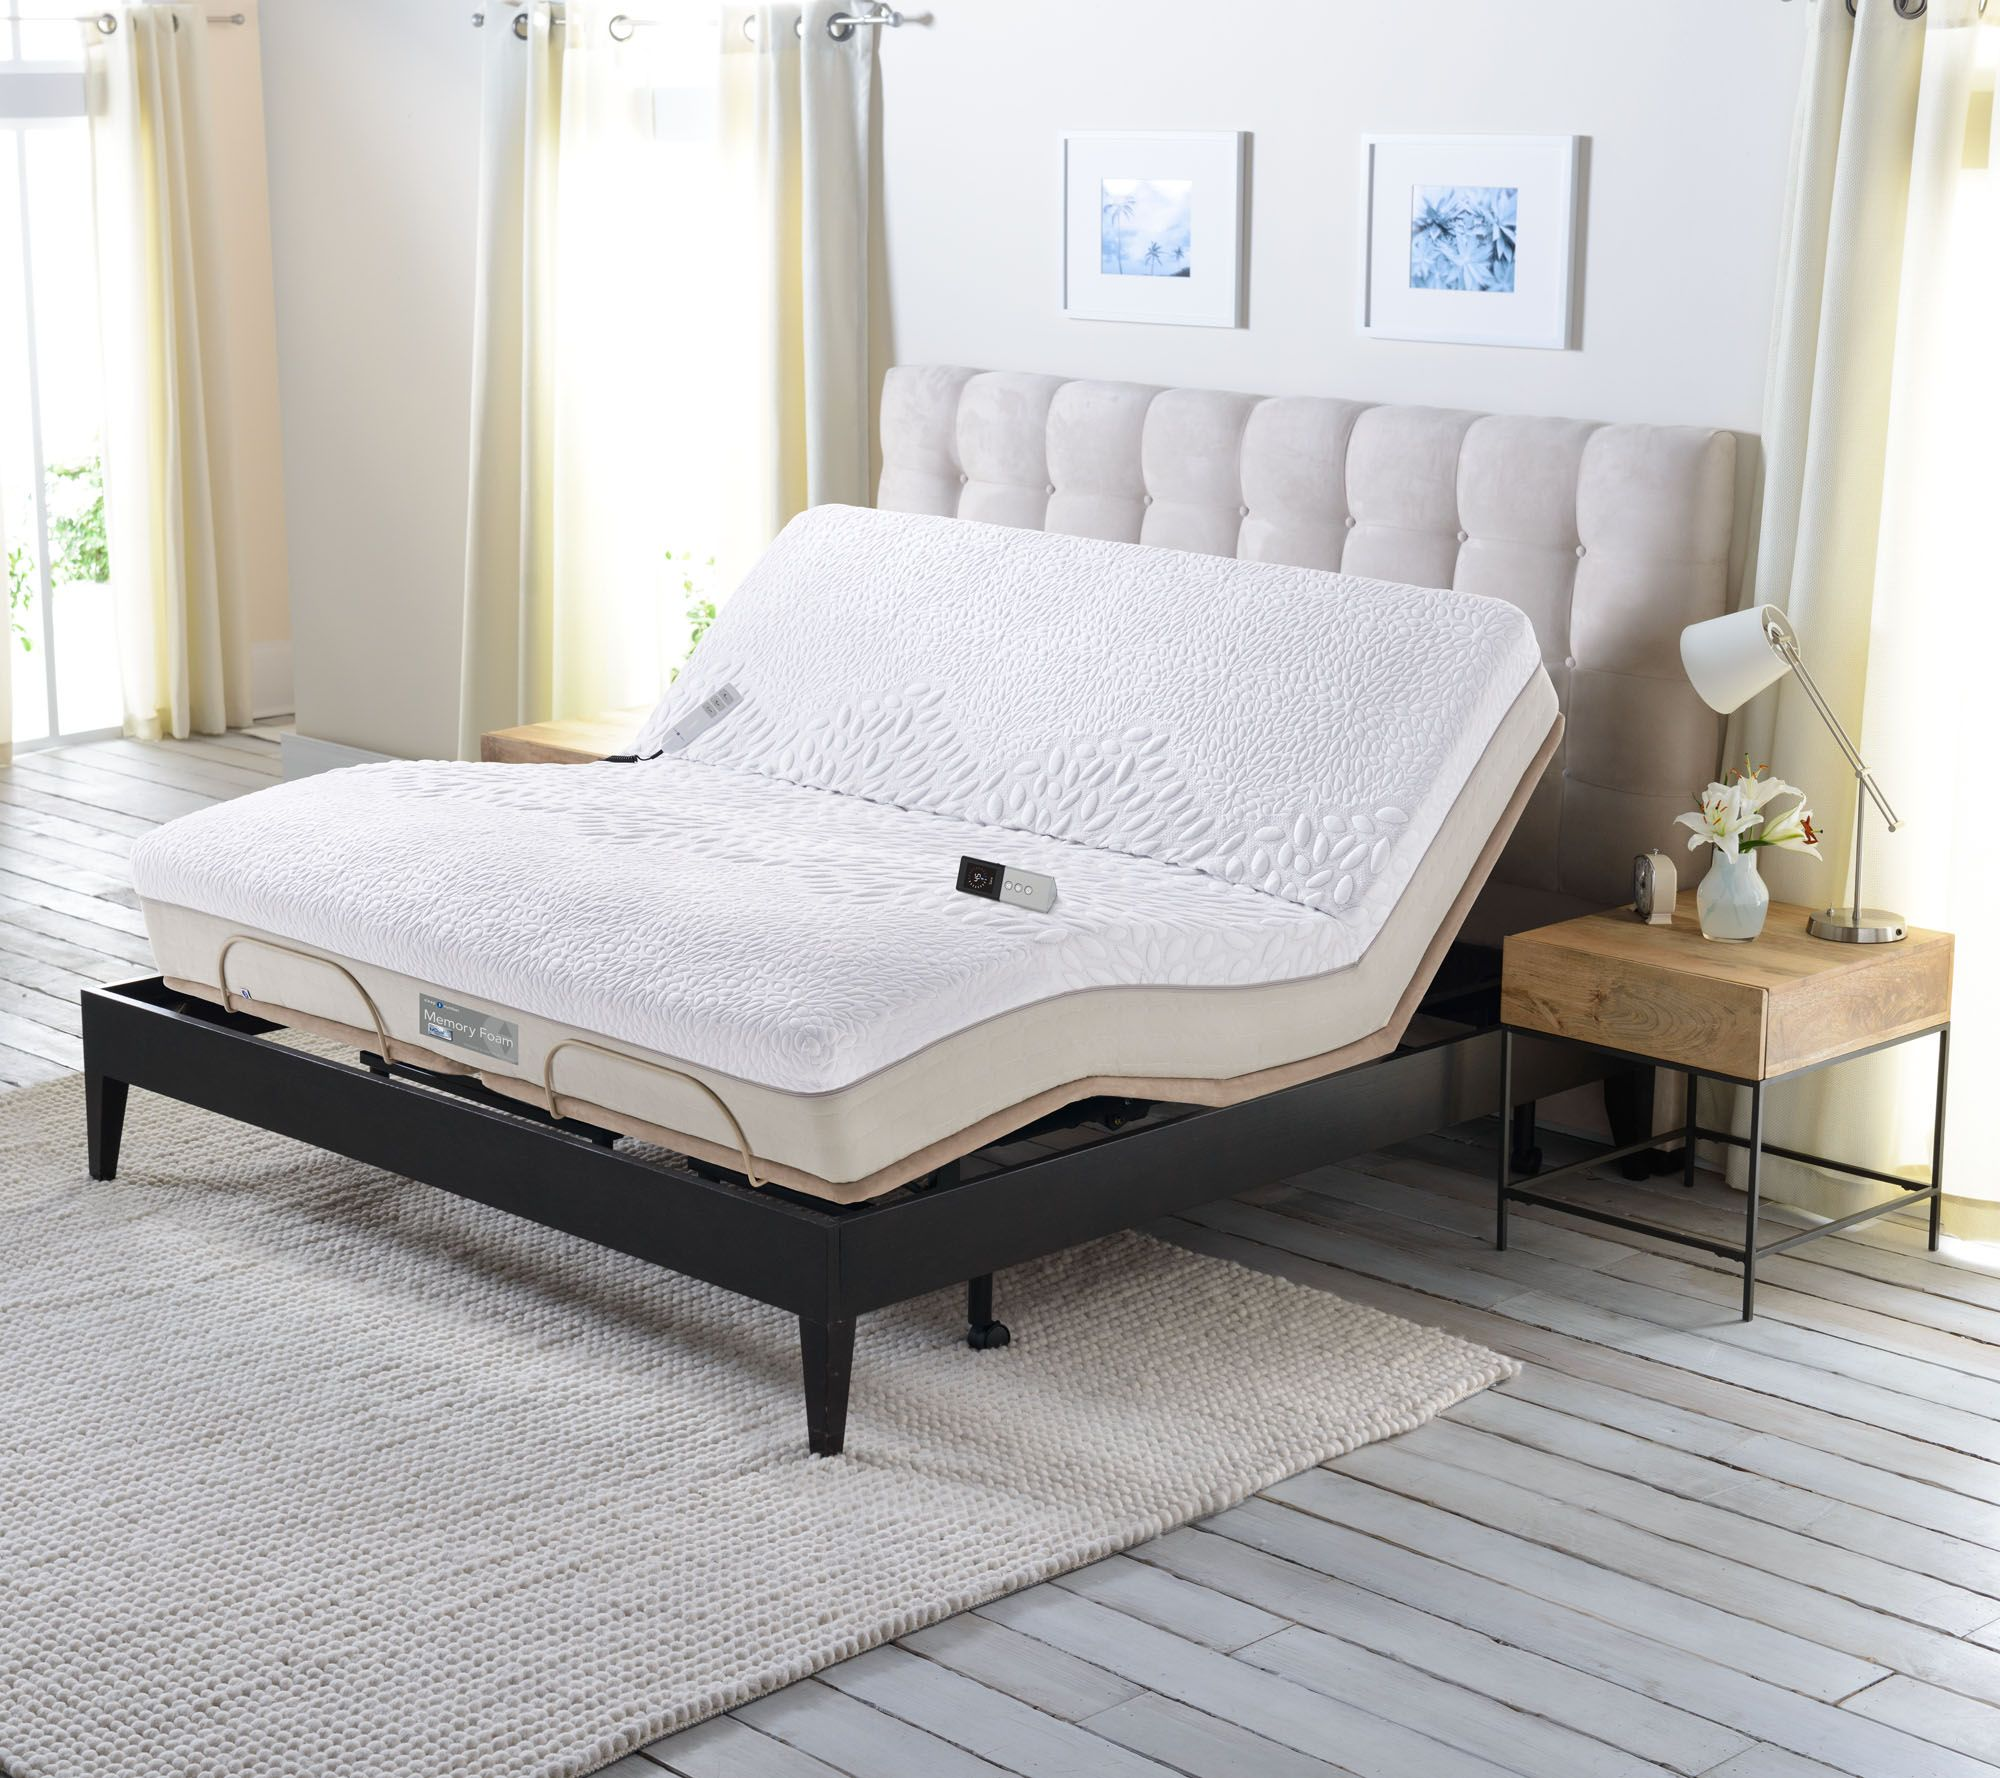 Sleep Number Memory Foam Full Mattress With Adjustable